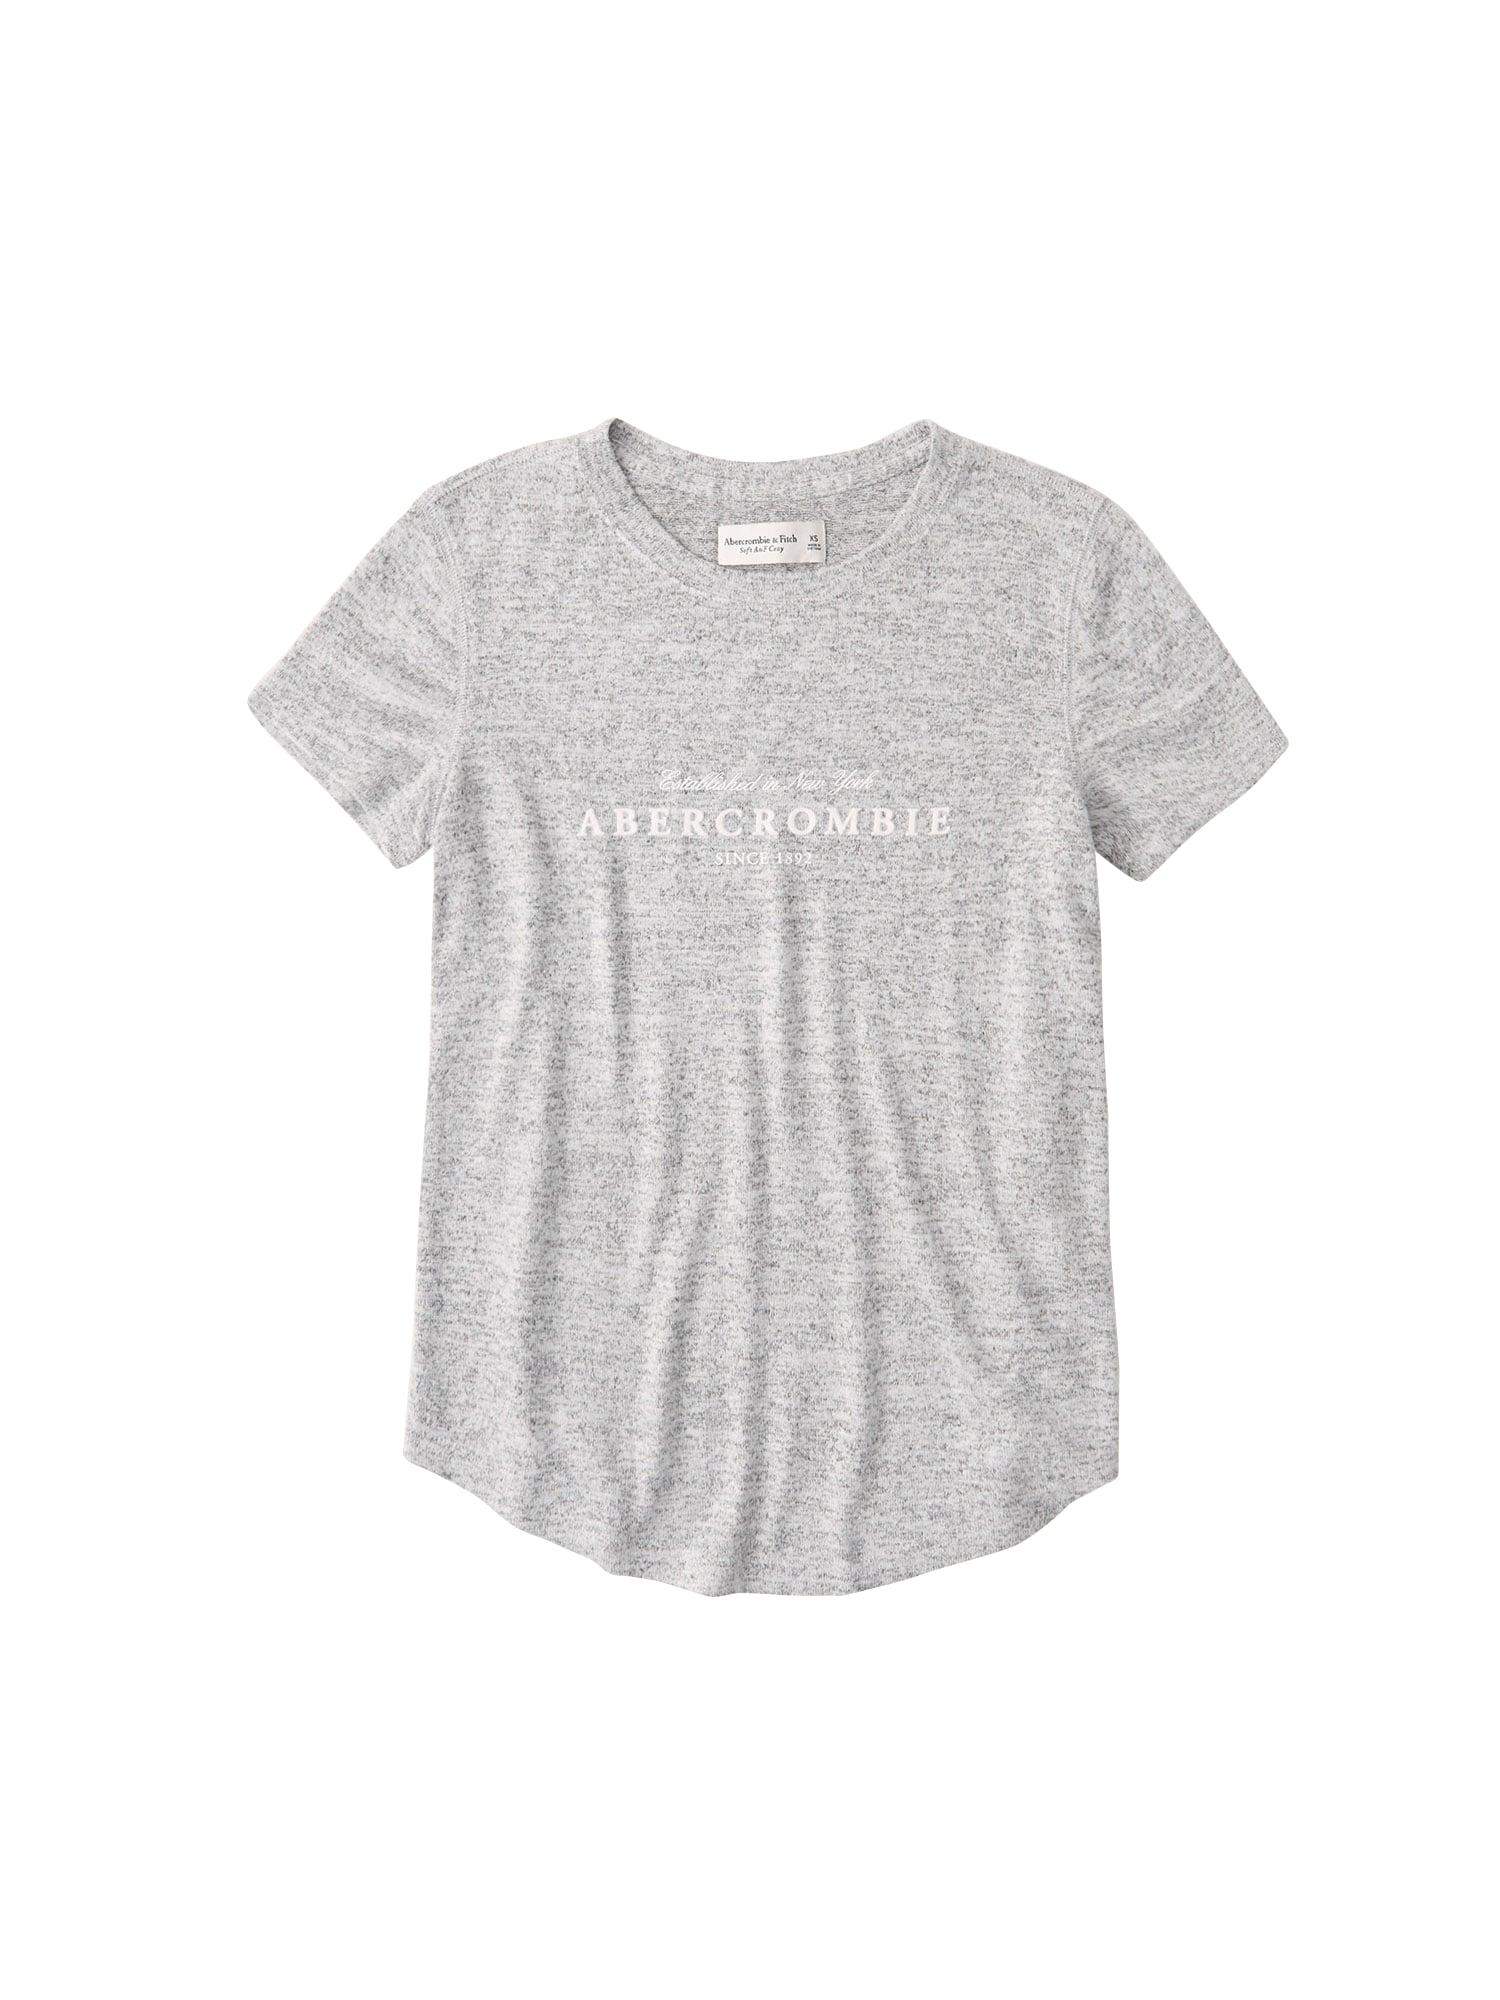 Abercrombie & Fitch Marškinėliai margai pilka / balta